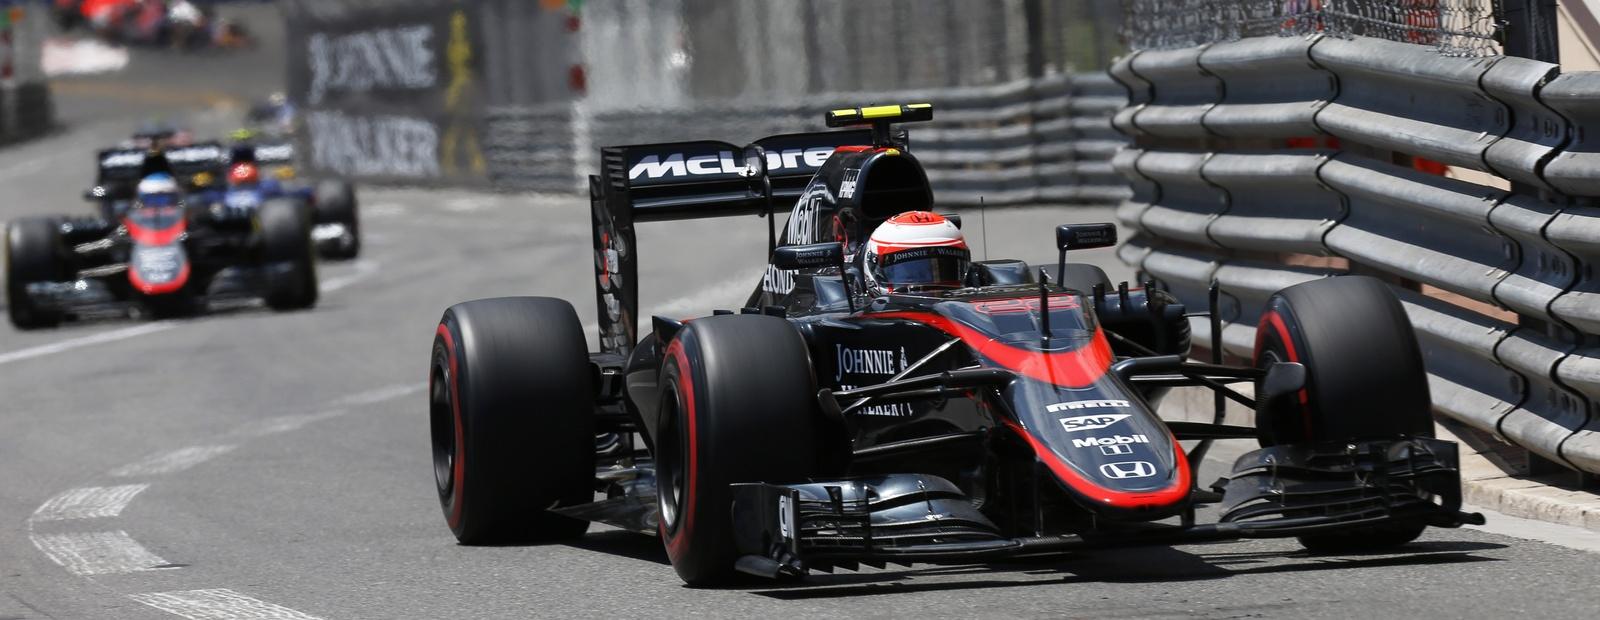 mclaren formula 1 - 2015 monaco grand prix race report